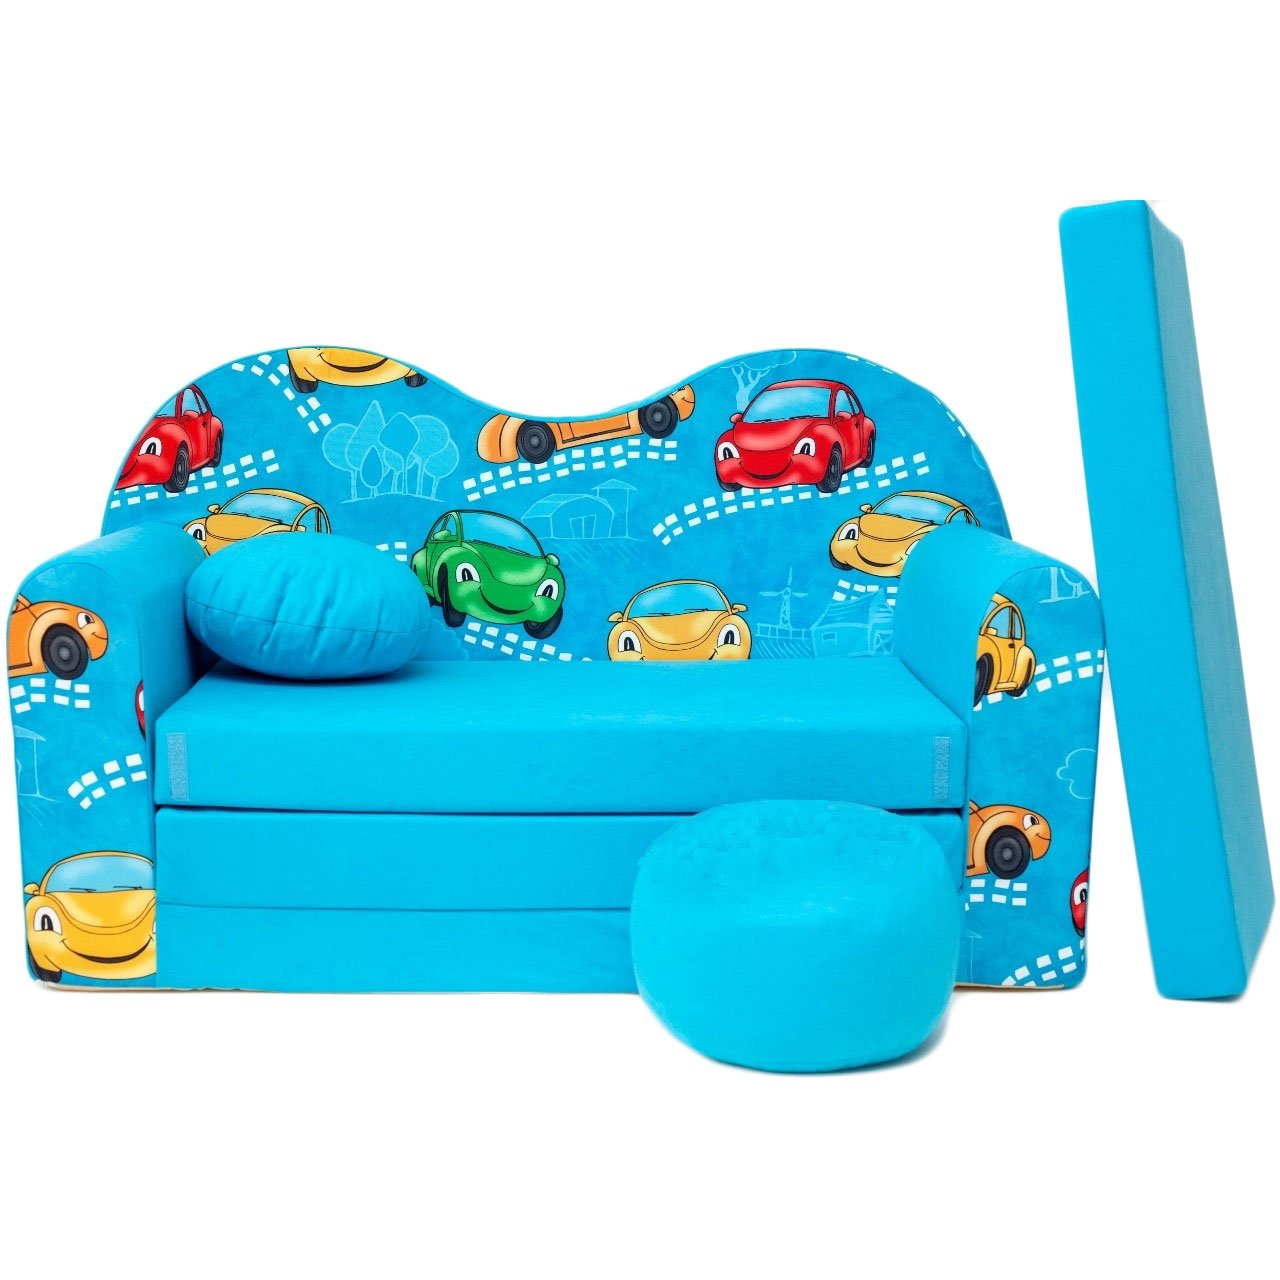 B11 S Minicouch Kindersofa Kinder Sofa Set Kindersessel Sitzkissen Matratze